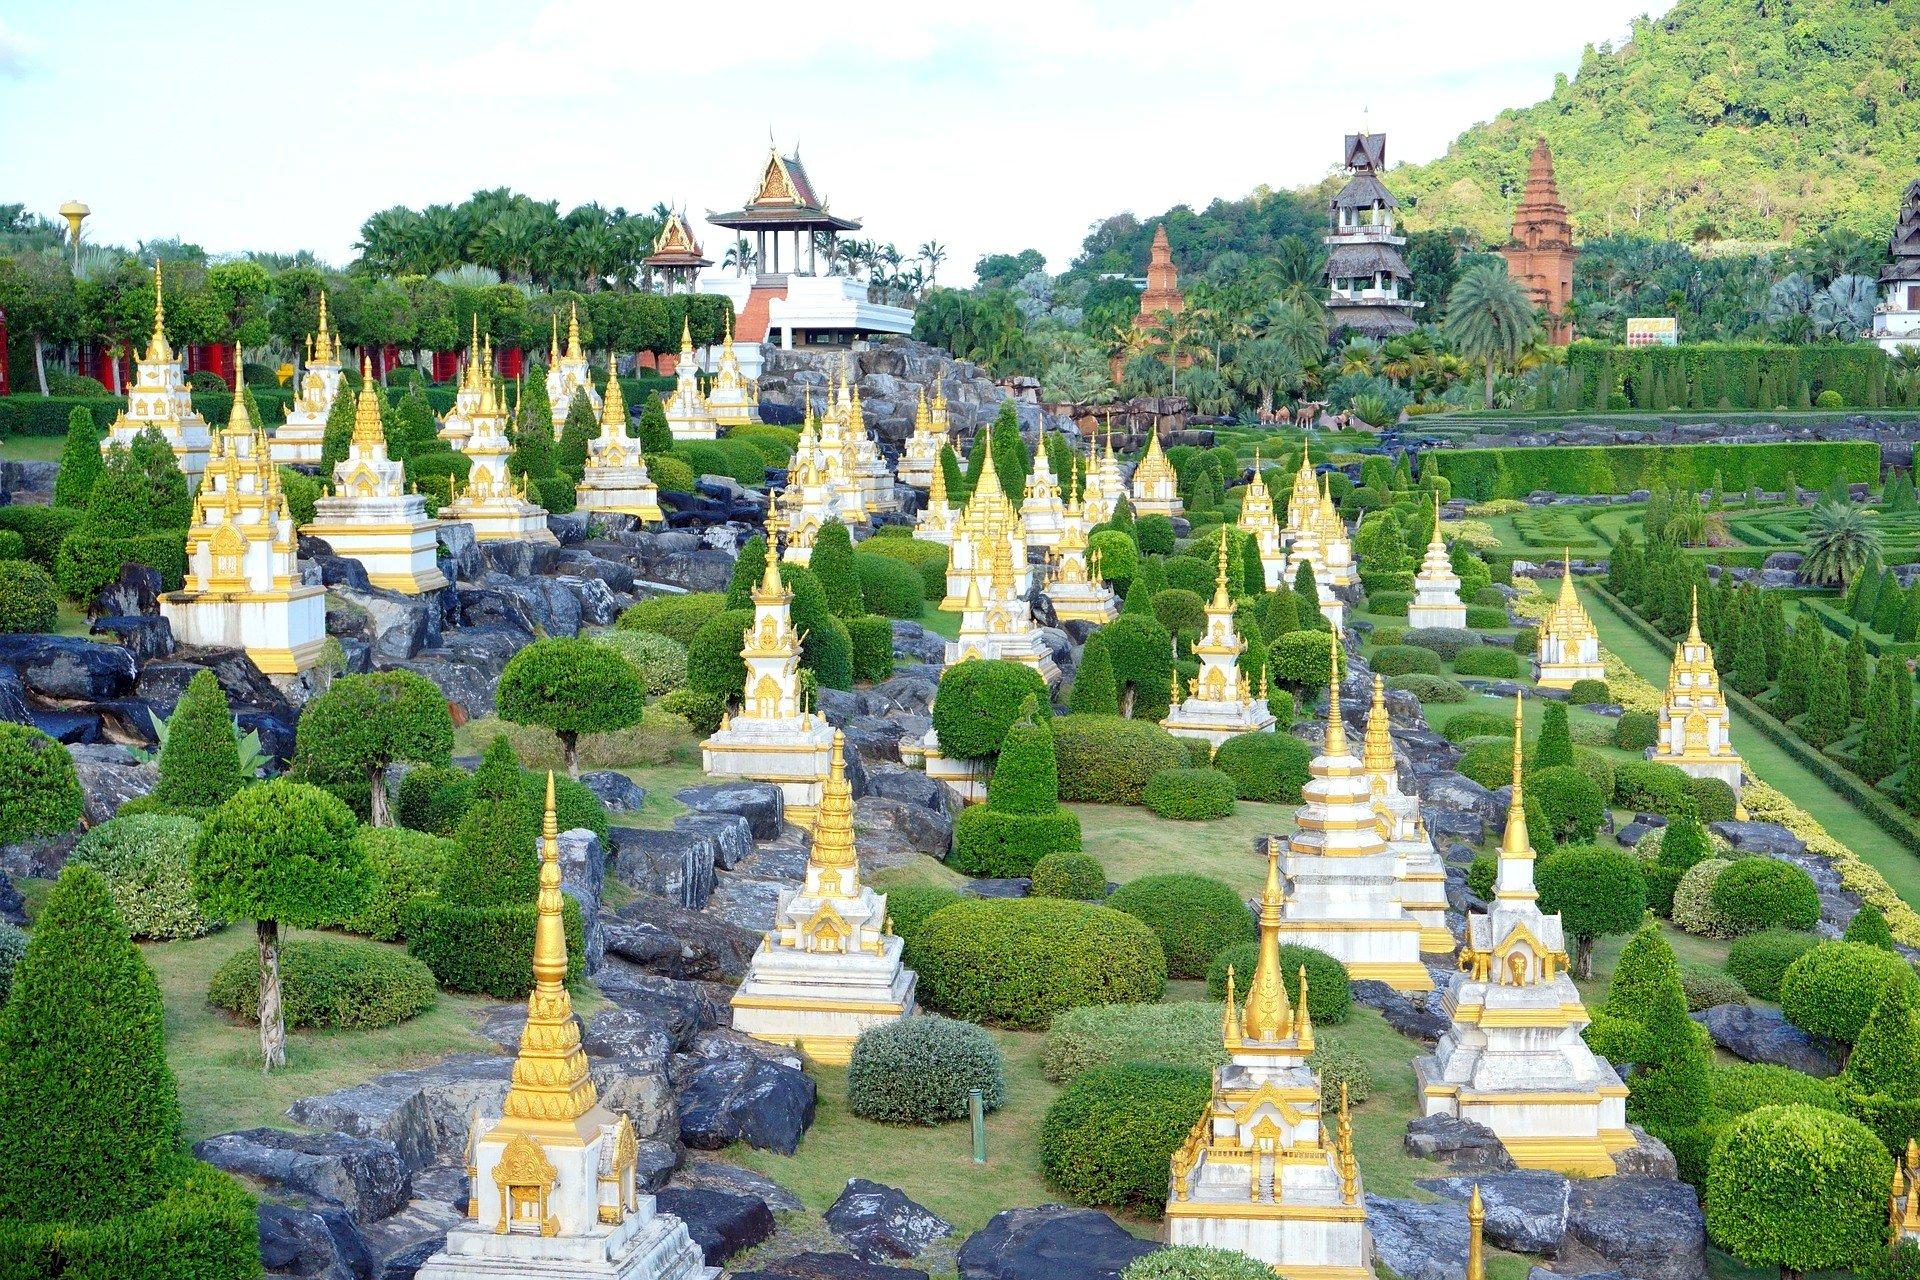 Nong Nooch Tropical Garden near Pattaya